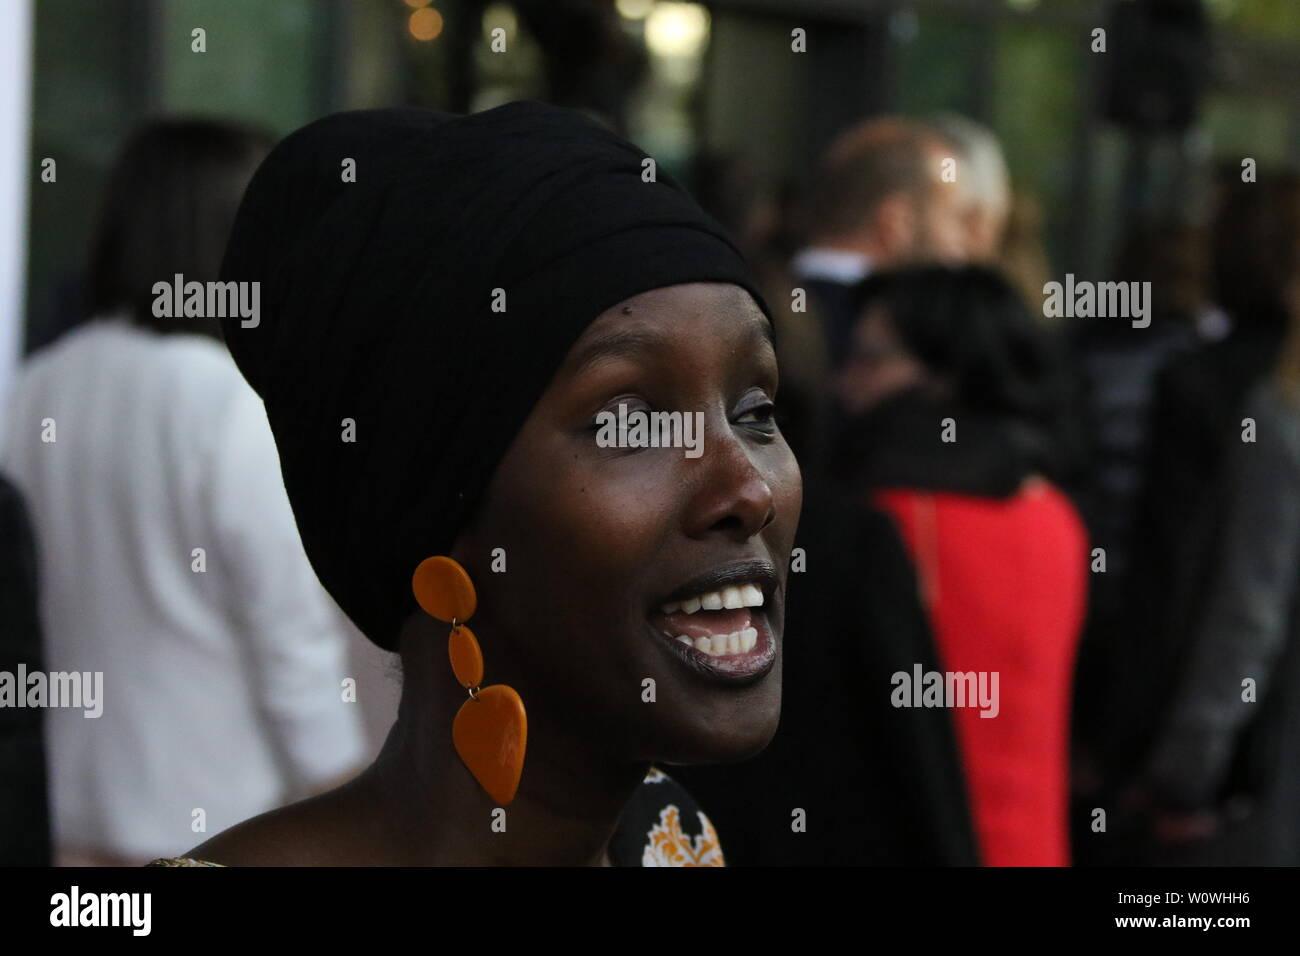 Sonderpreis 2018, Fatuma Musa Afrah (Laudator: Christian Wulff) beim Radio Regenbogen Award Rust 2019 Stock Photo